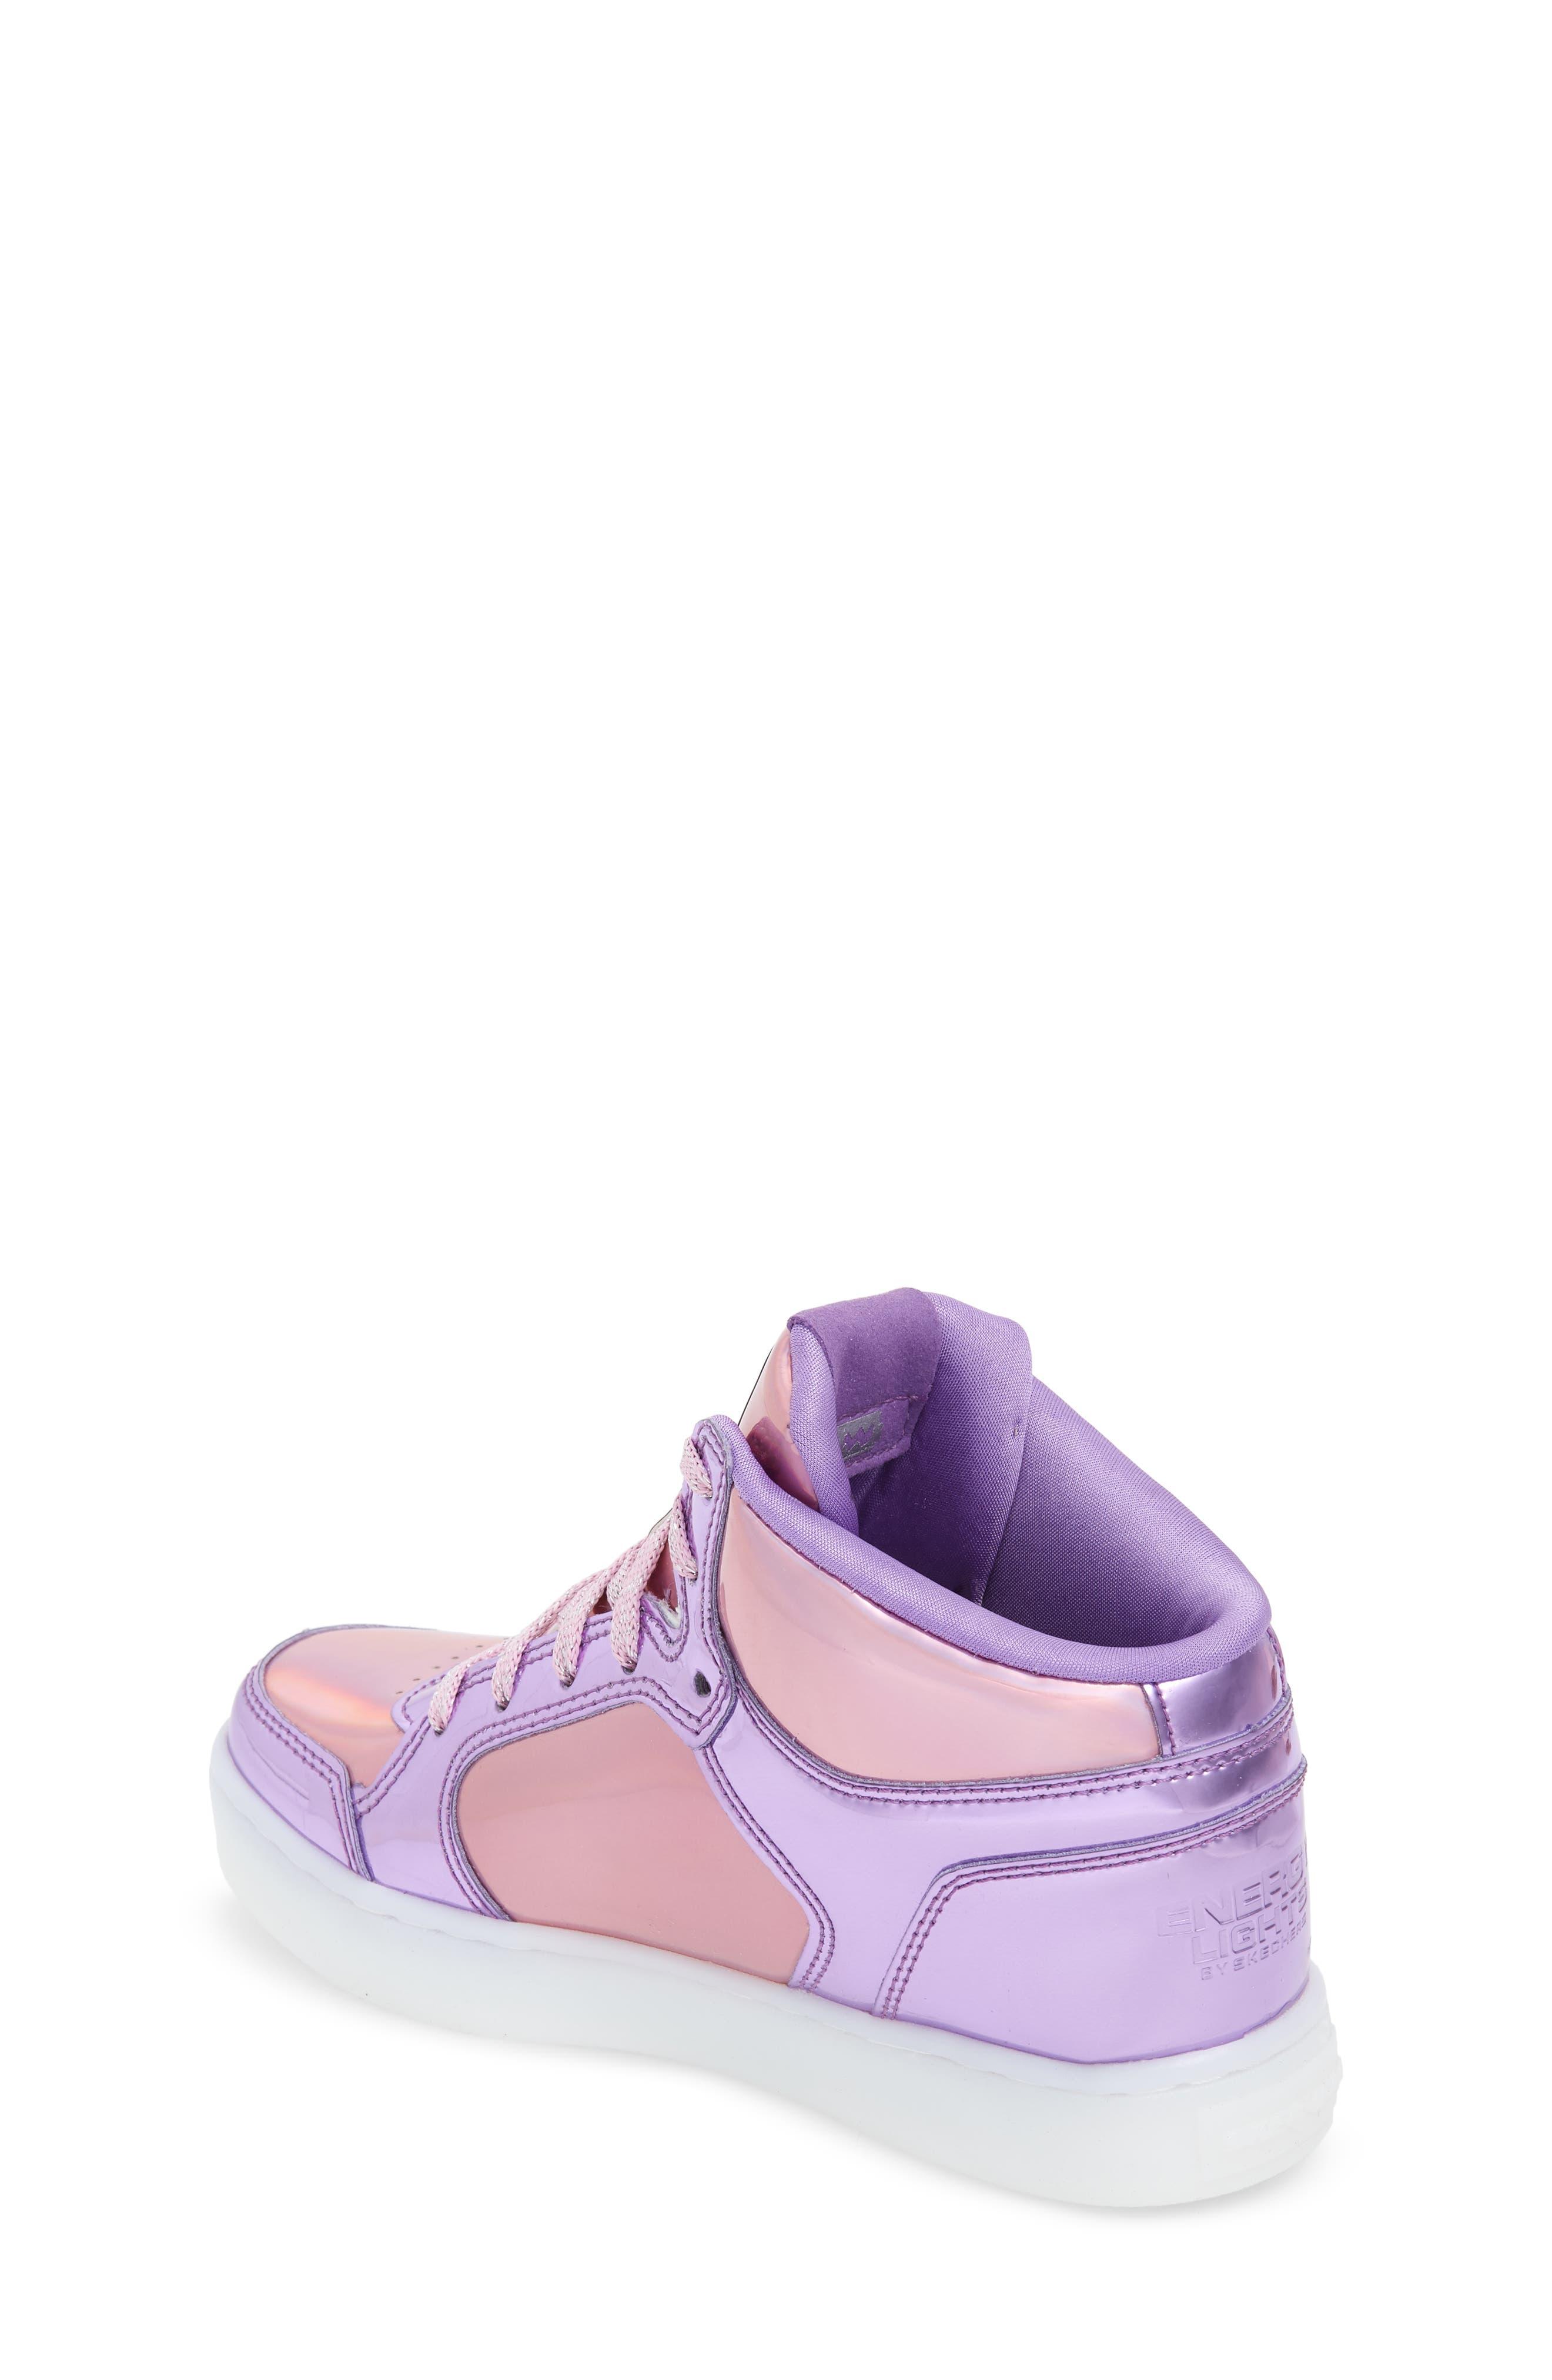 Energy Lights Metallic High Top Sneaker,                             Alternate thumbnail 2, color,                             Pink/ Purple